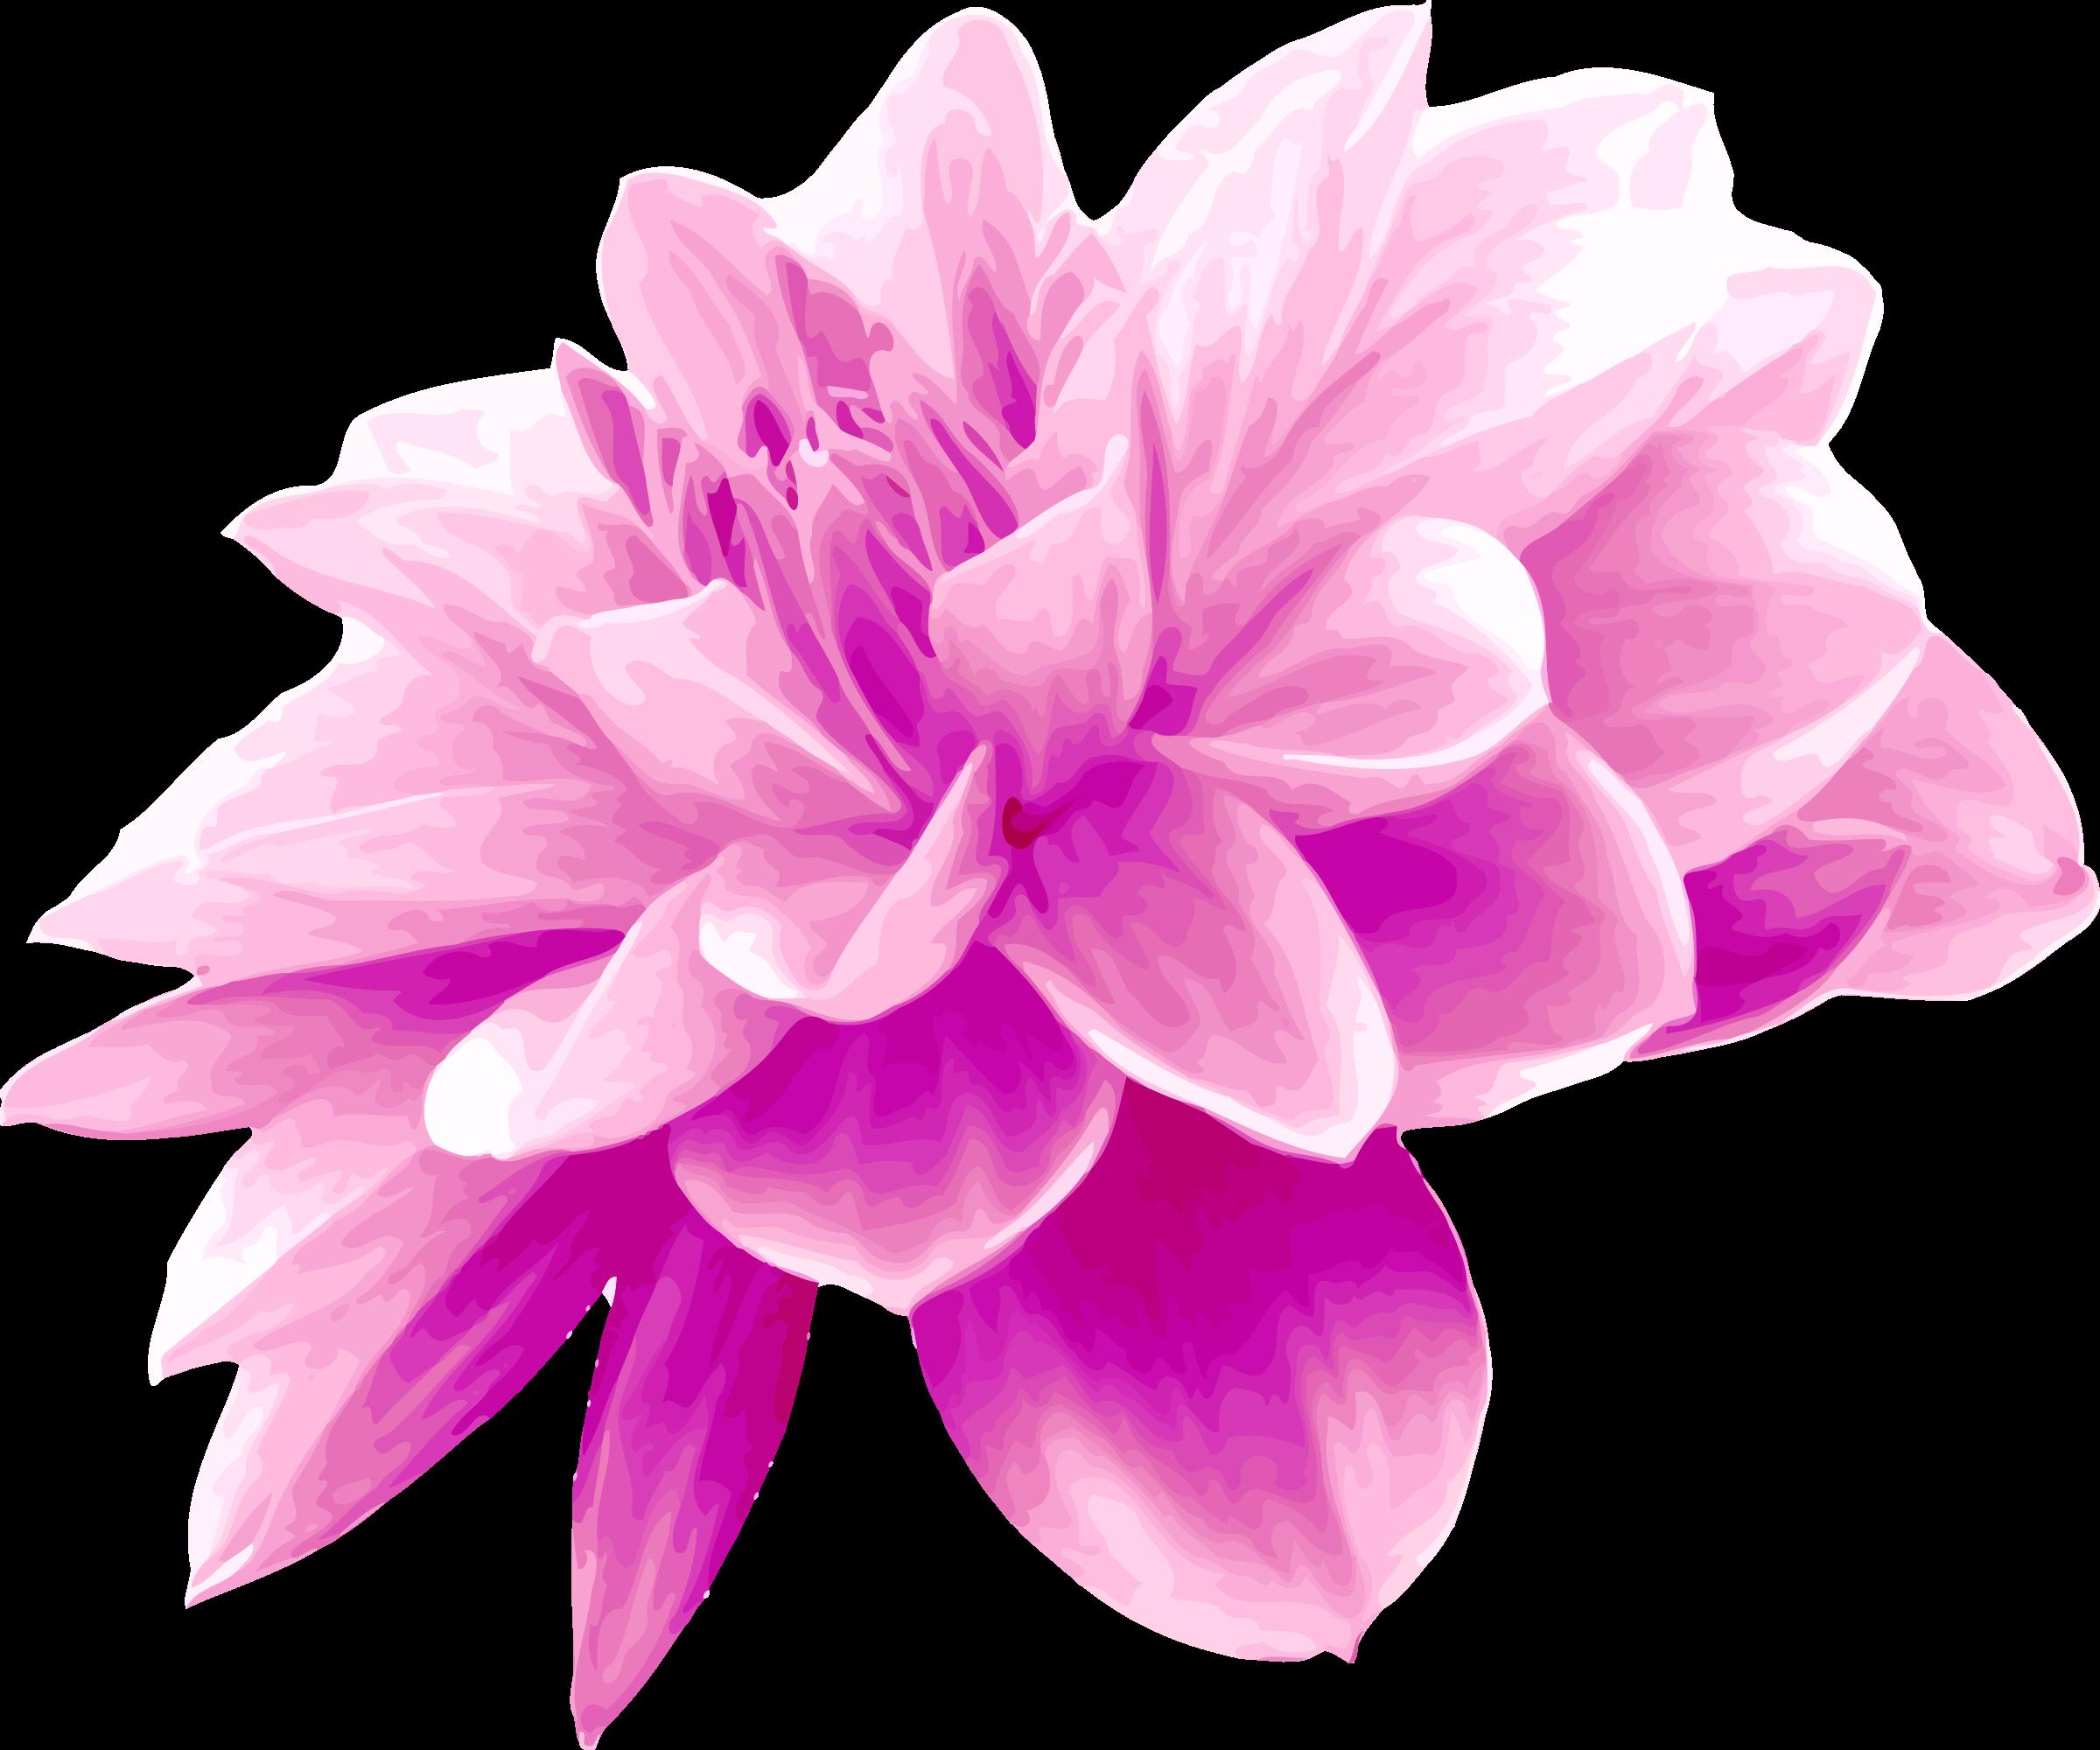 Clipart - Pink flower